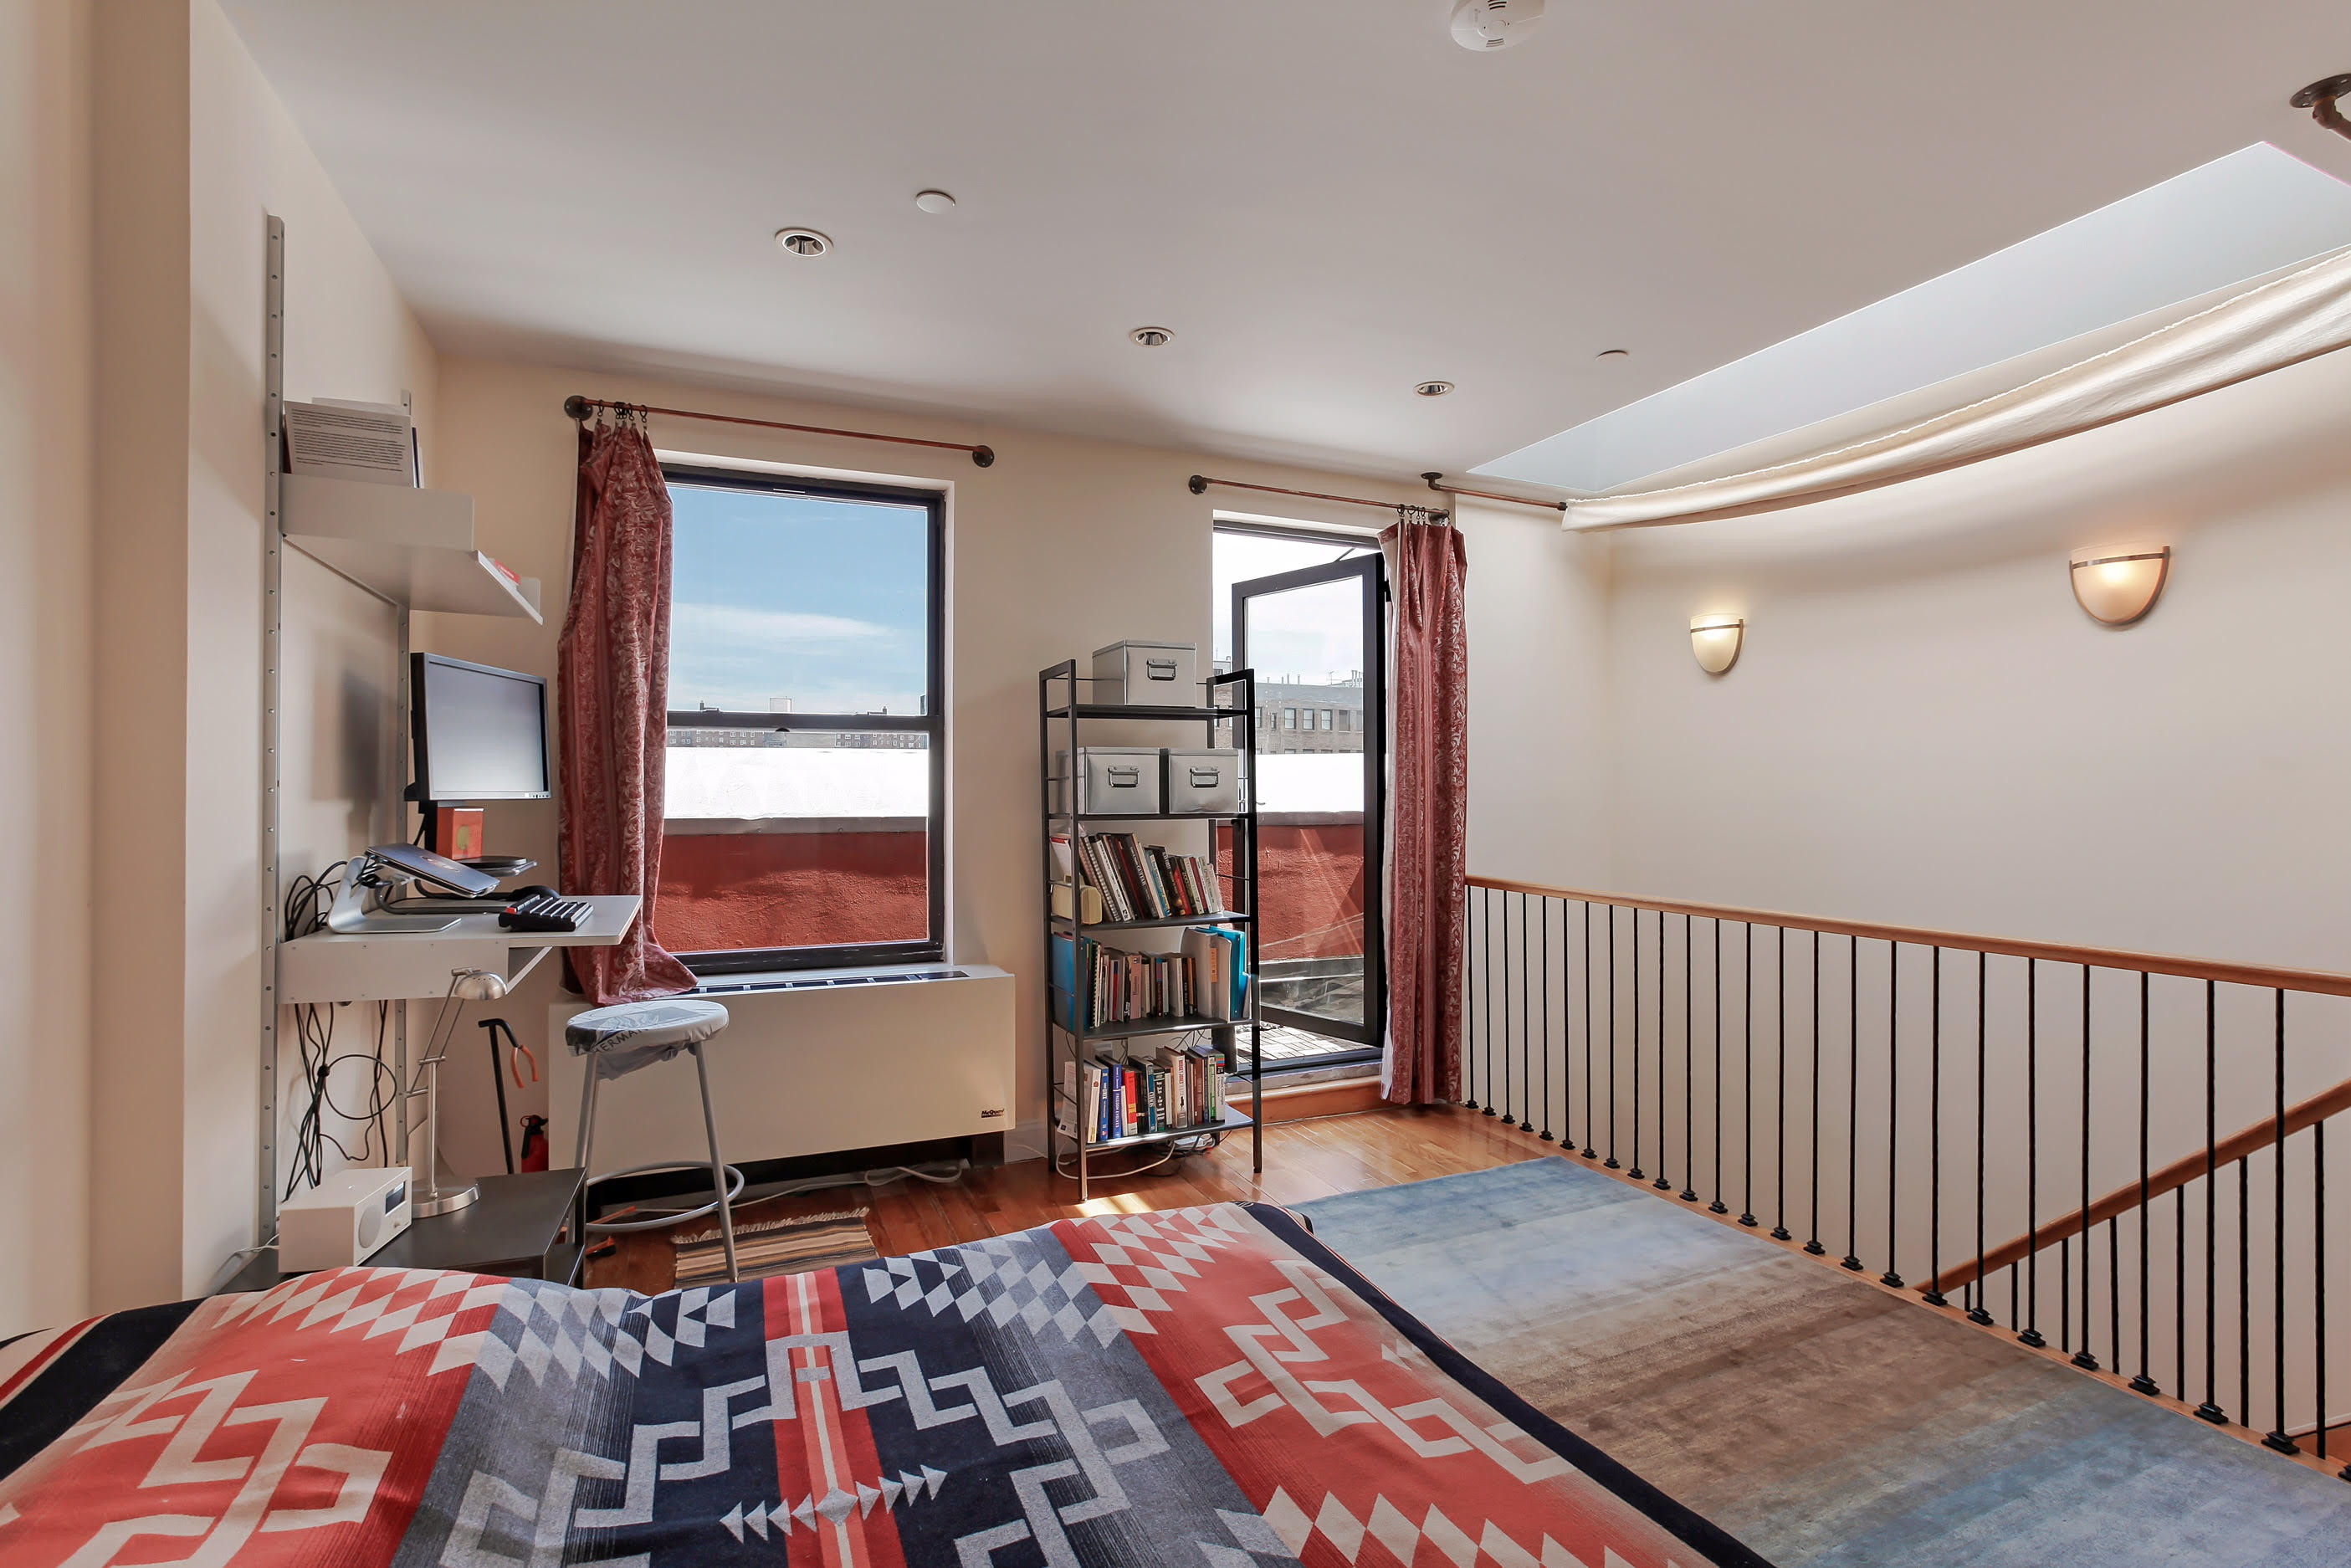 252 West 123rd Street, harlem, upstairs, bedroom, terrace, duplex, roof